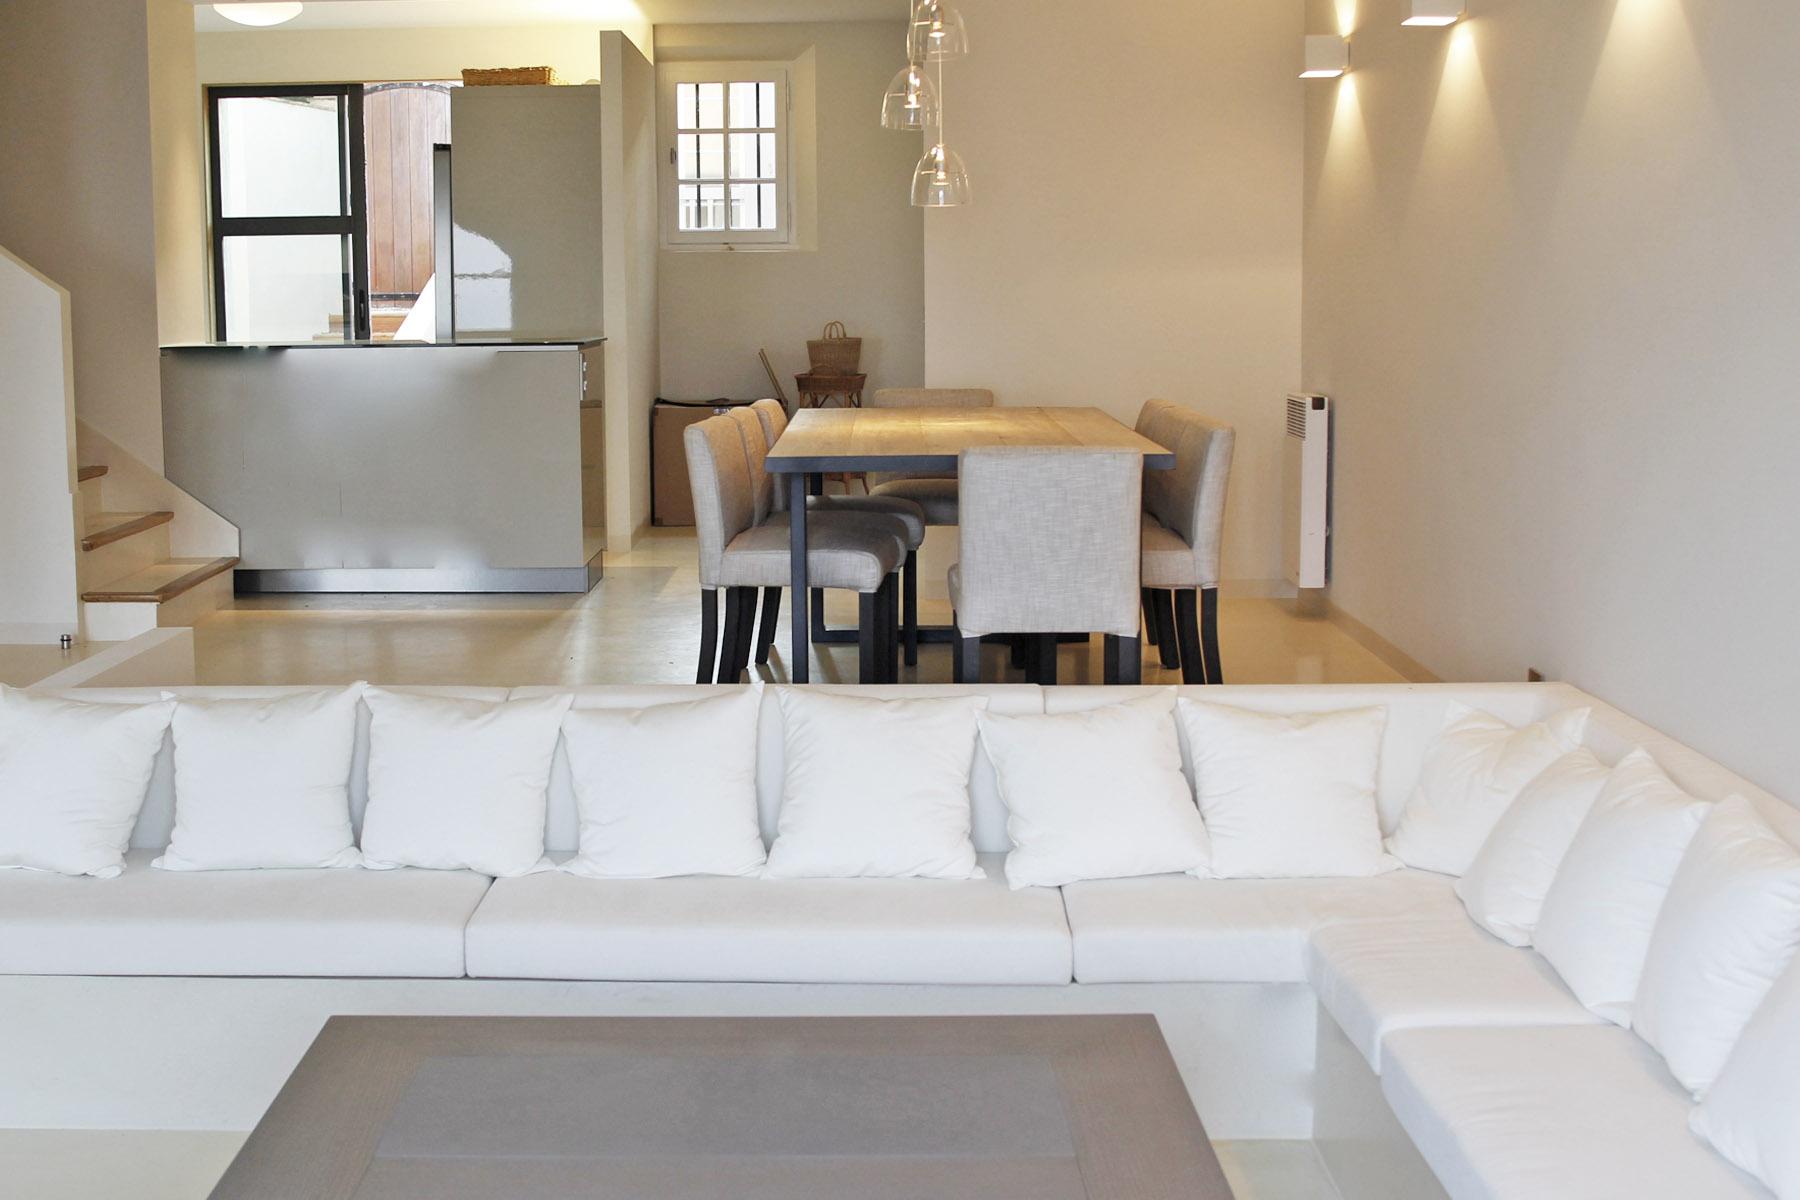 L2-Florence_Watine_Architecte_Designer_Decoratrice_Paris_France-3